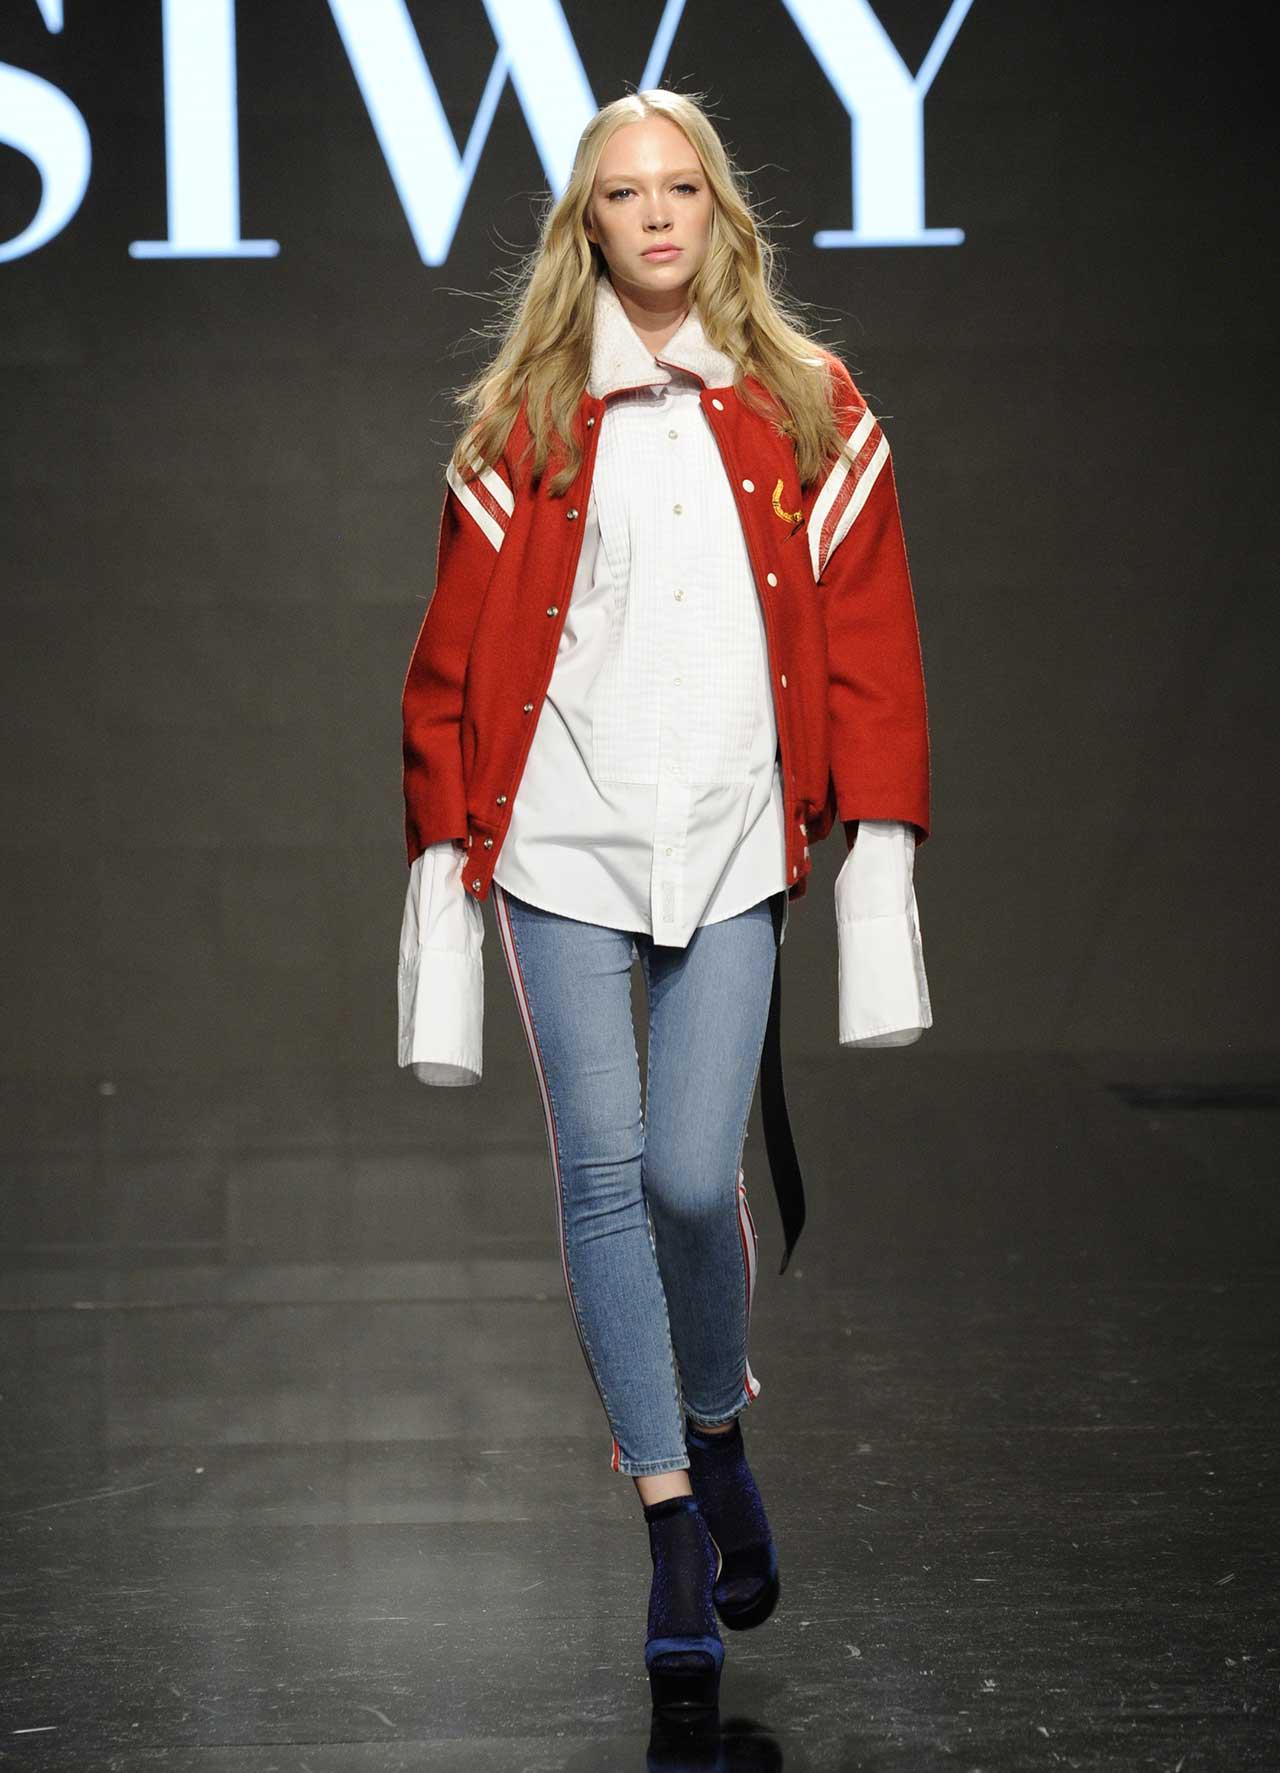 siwy-ss17-runway-show-denim-jeans-11